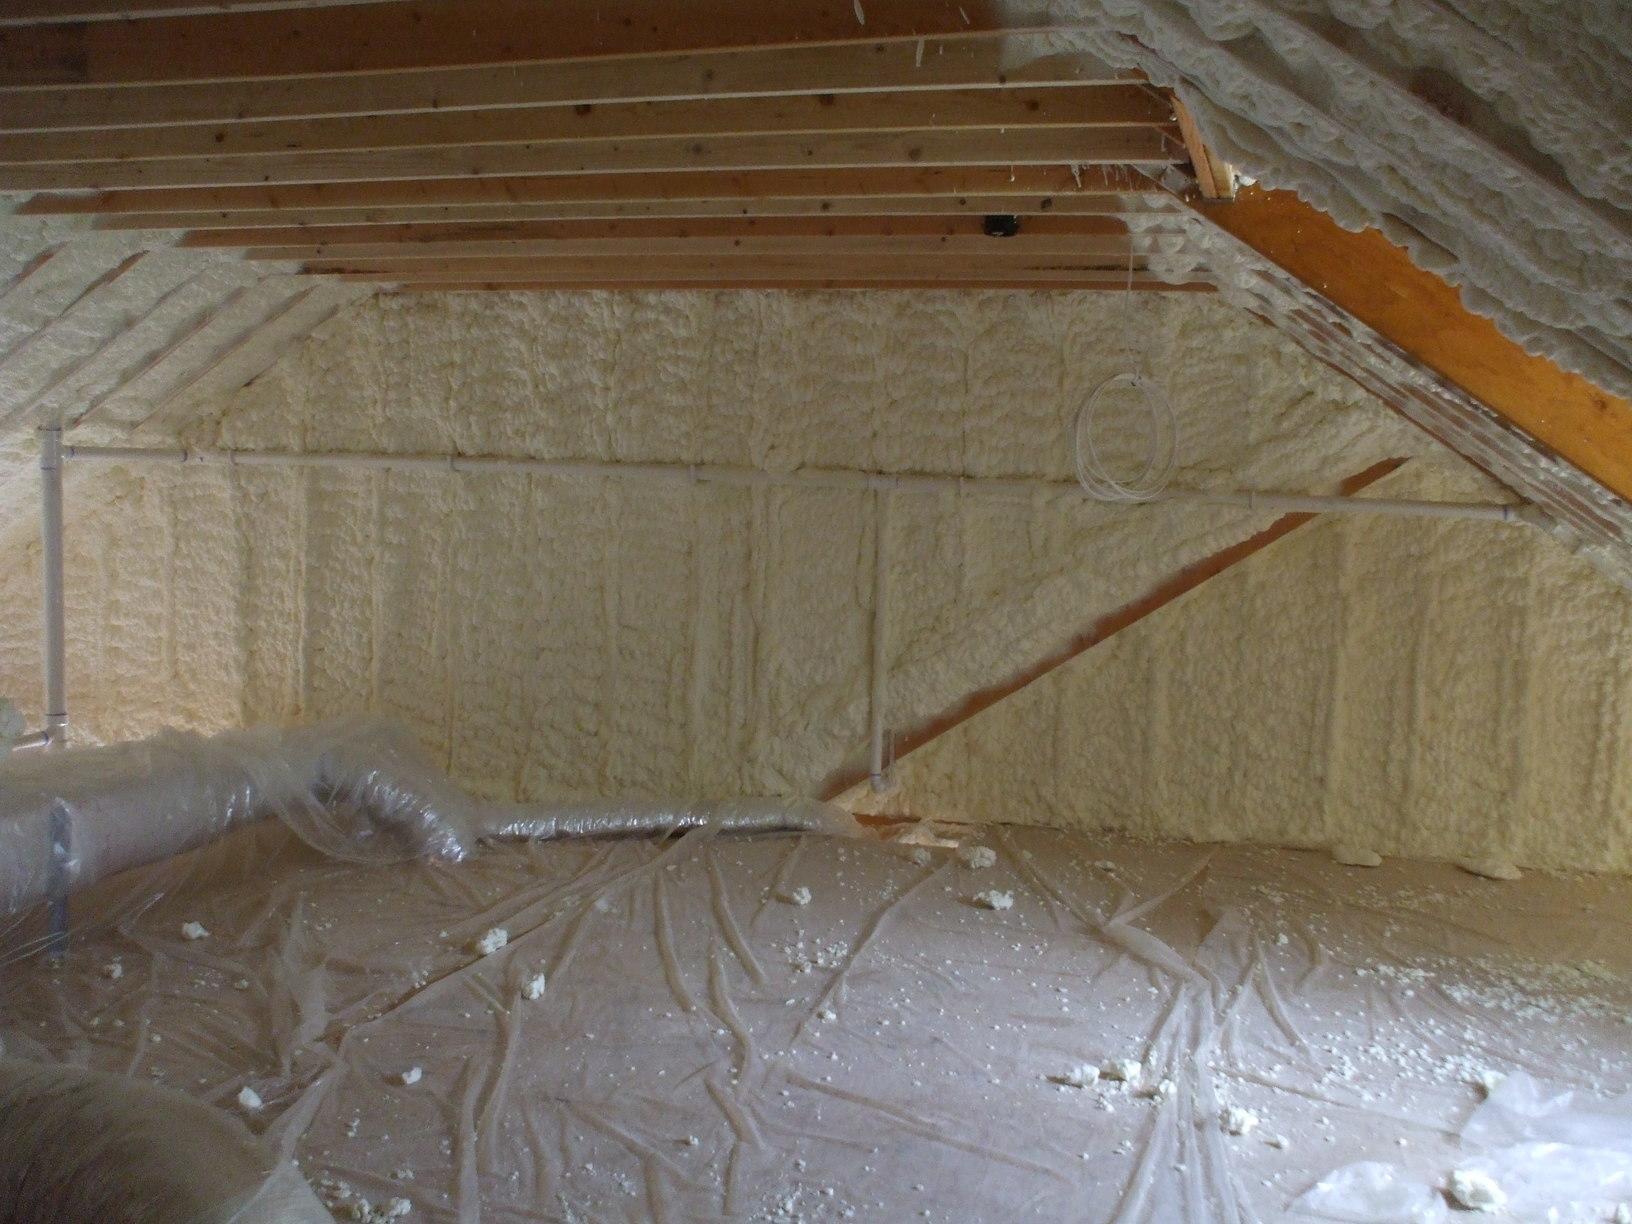 Attic Insulated with Spray Foam